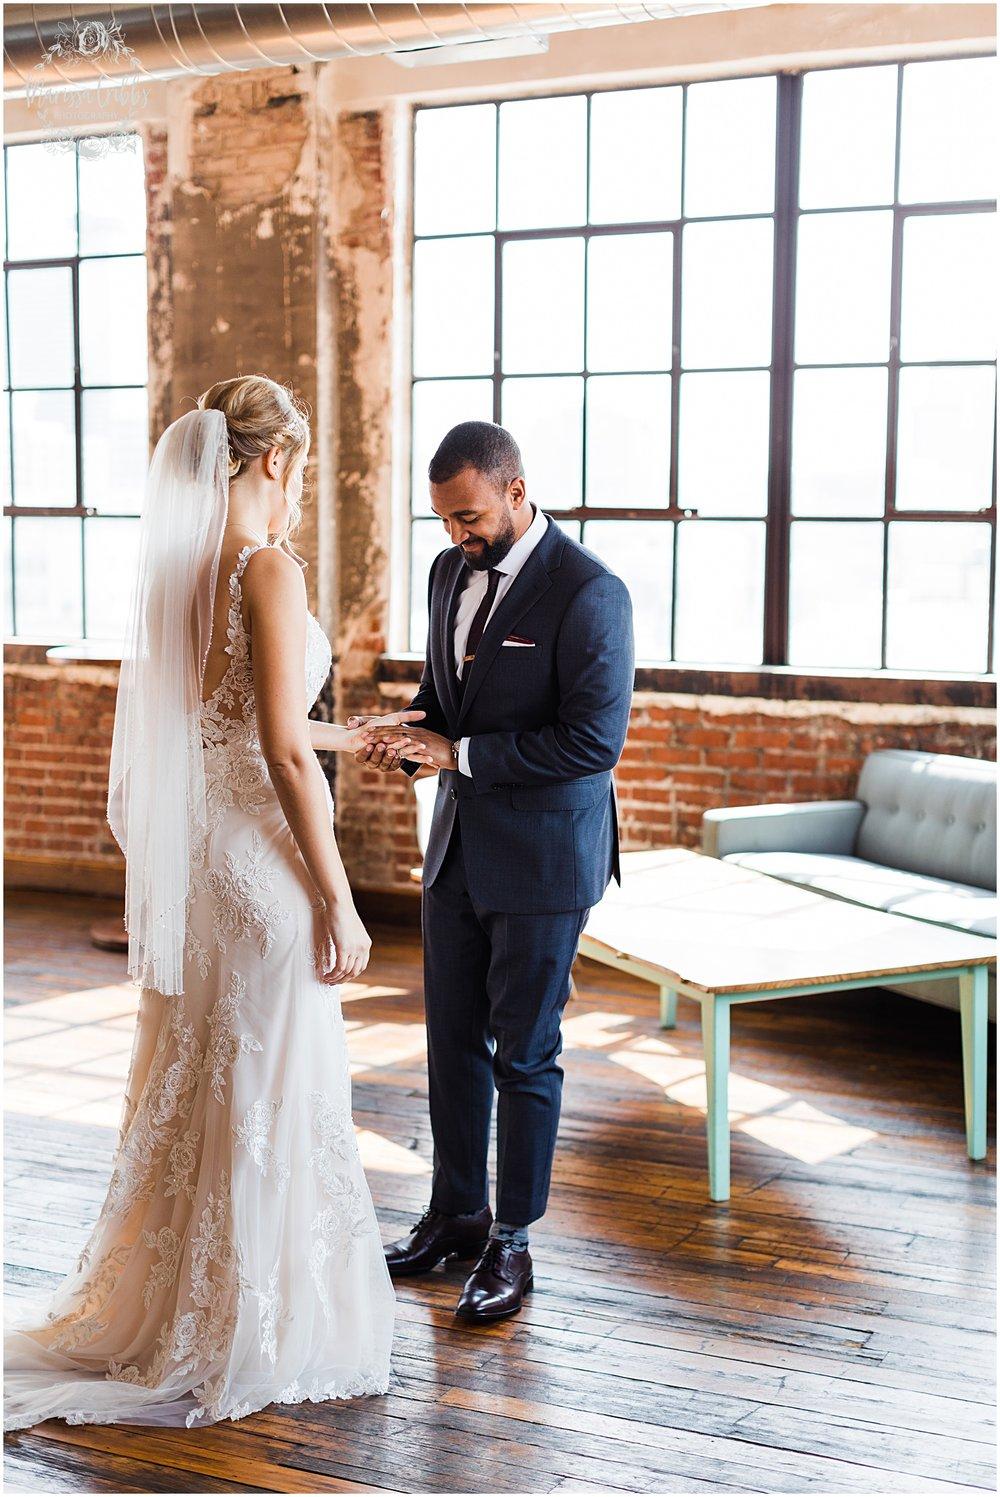 BAUER WEDDING | KELSEA & JUSTIN | MARISSA CRIBBS PHOTOGRAPHY_6507.jpg